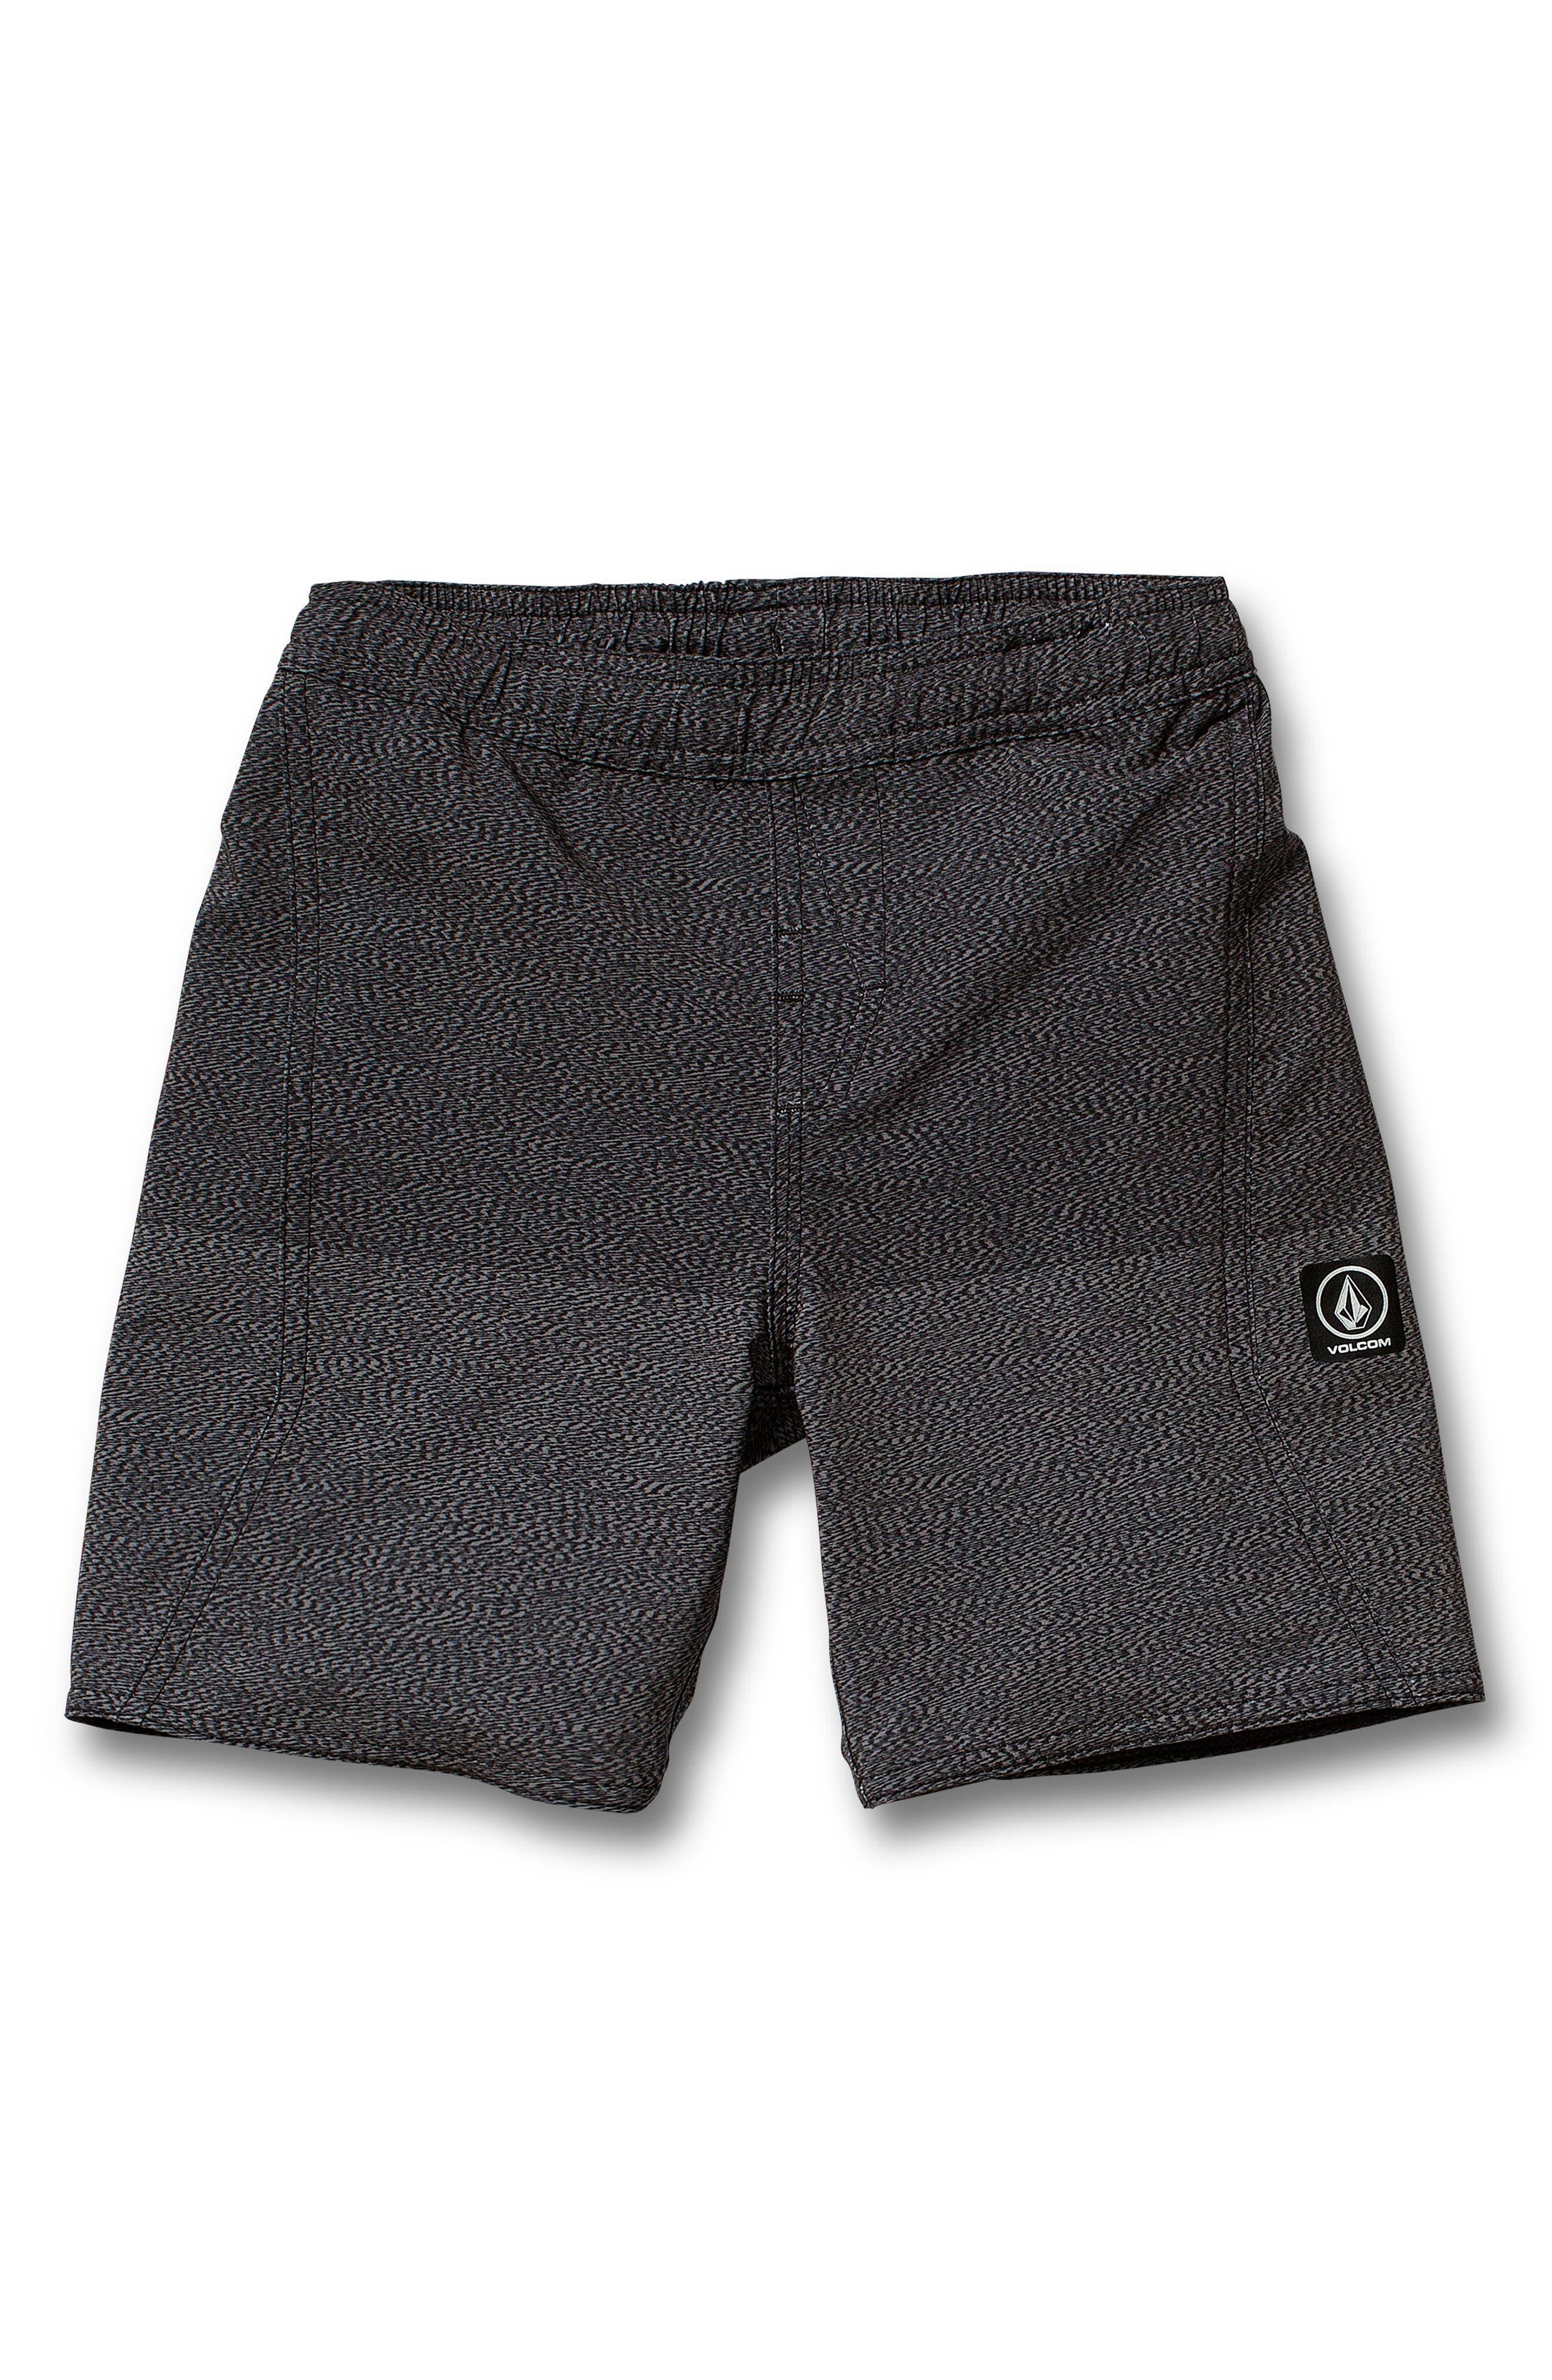 Lido Volley Swim Shorts,                         Main,                         color, BLACK